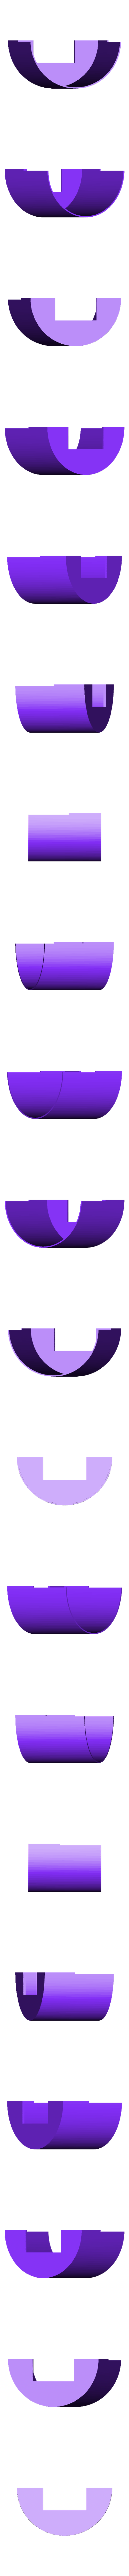 Nose_Shell.stl Download free STL file Flyer Mk. 1 • 3D printing object, billbo1958